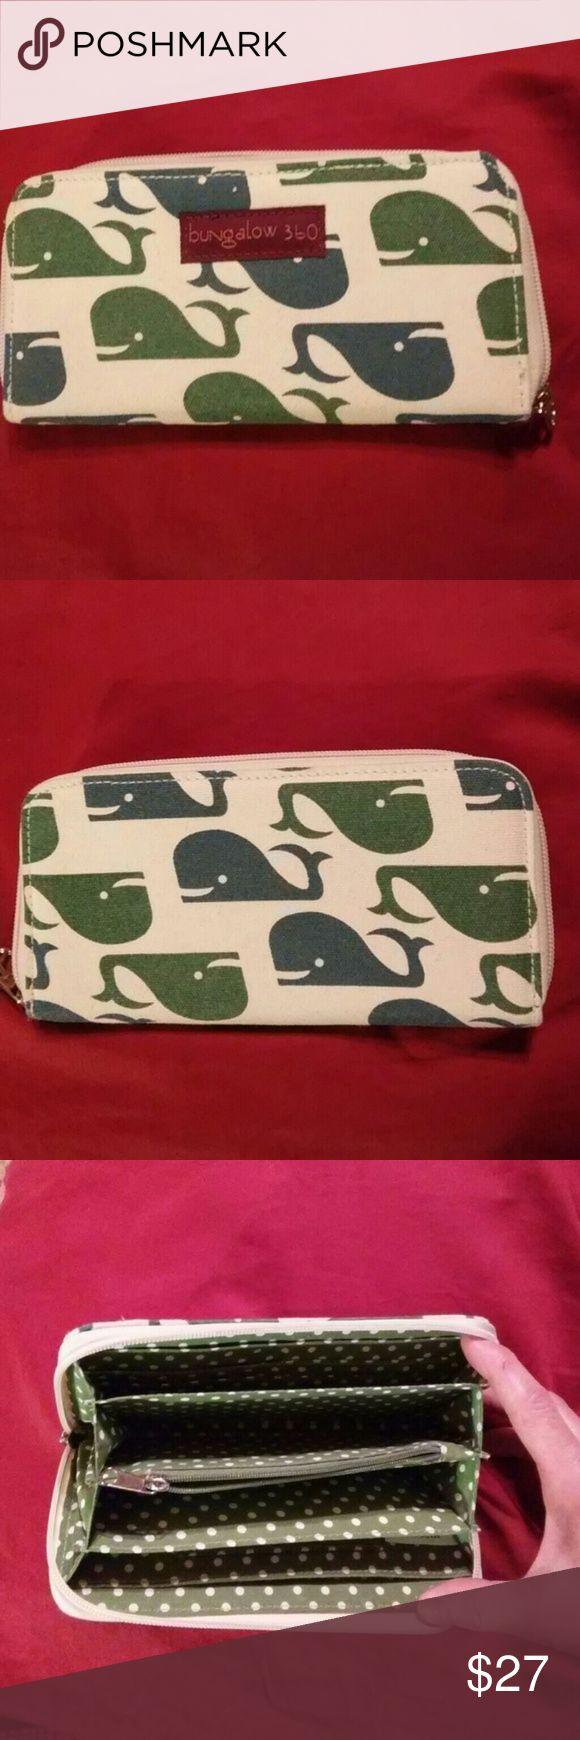 Whale Bungalow 360 Wallet Bungalow 360 Multicolor Whale Print Jacquard Zip Around Organizer, NWT never used, excellent condition. bungalow 360 Bags Wallets